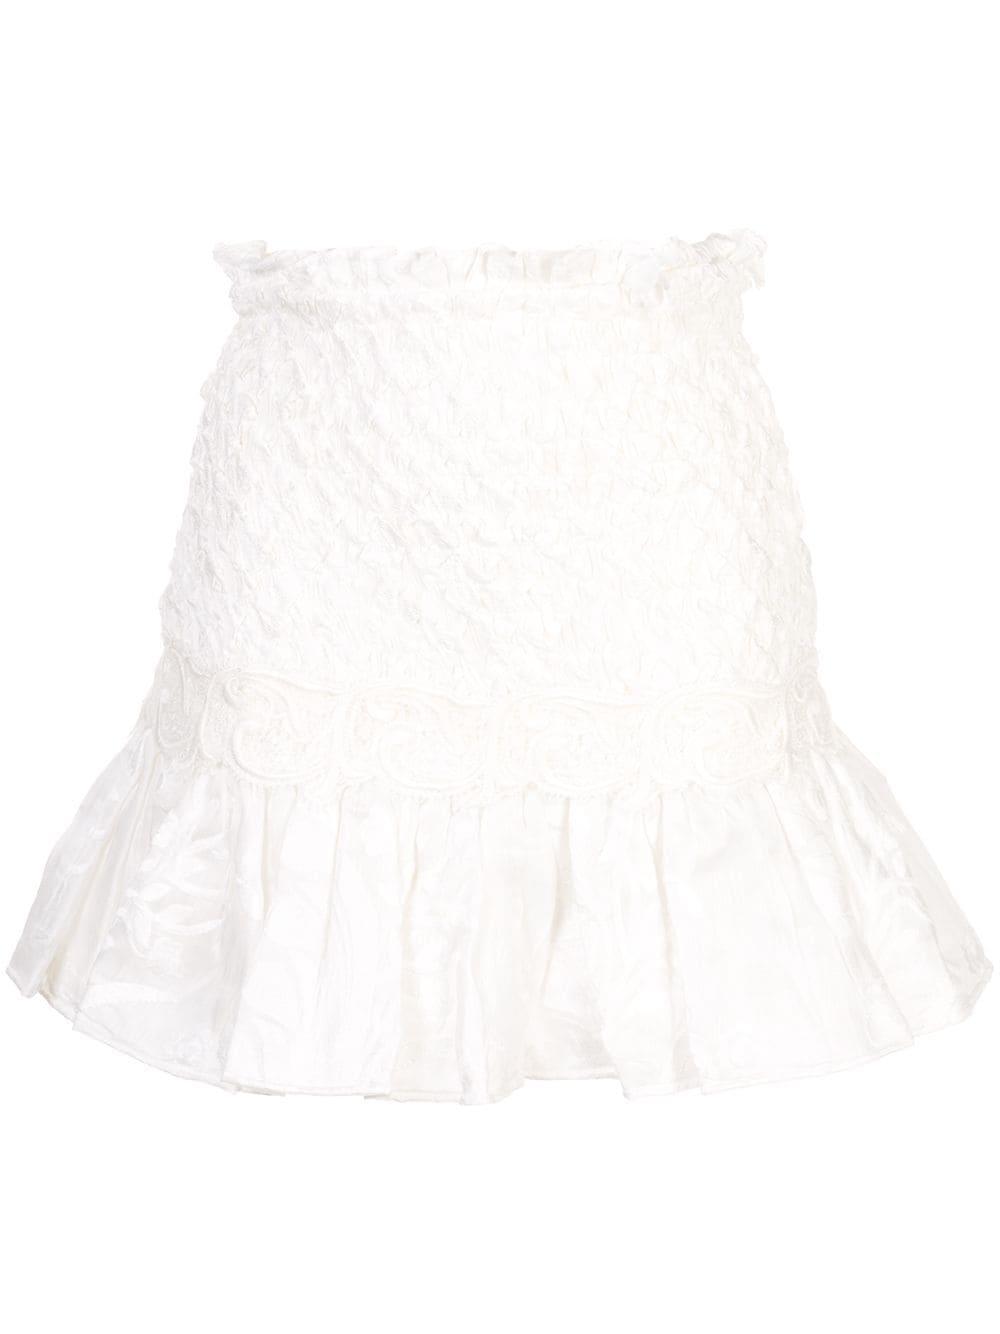 Lotus Ruched Mini Skirt Item # A21909185394